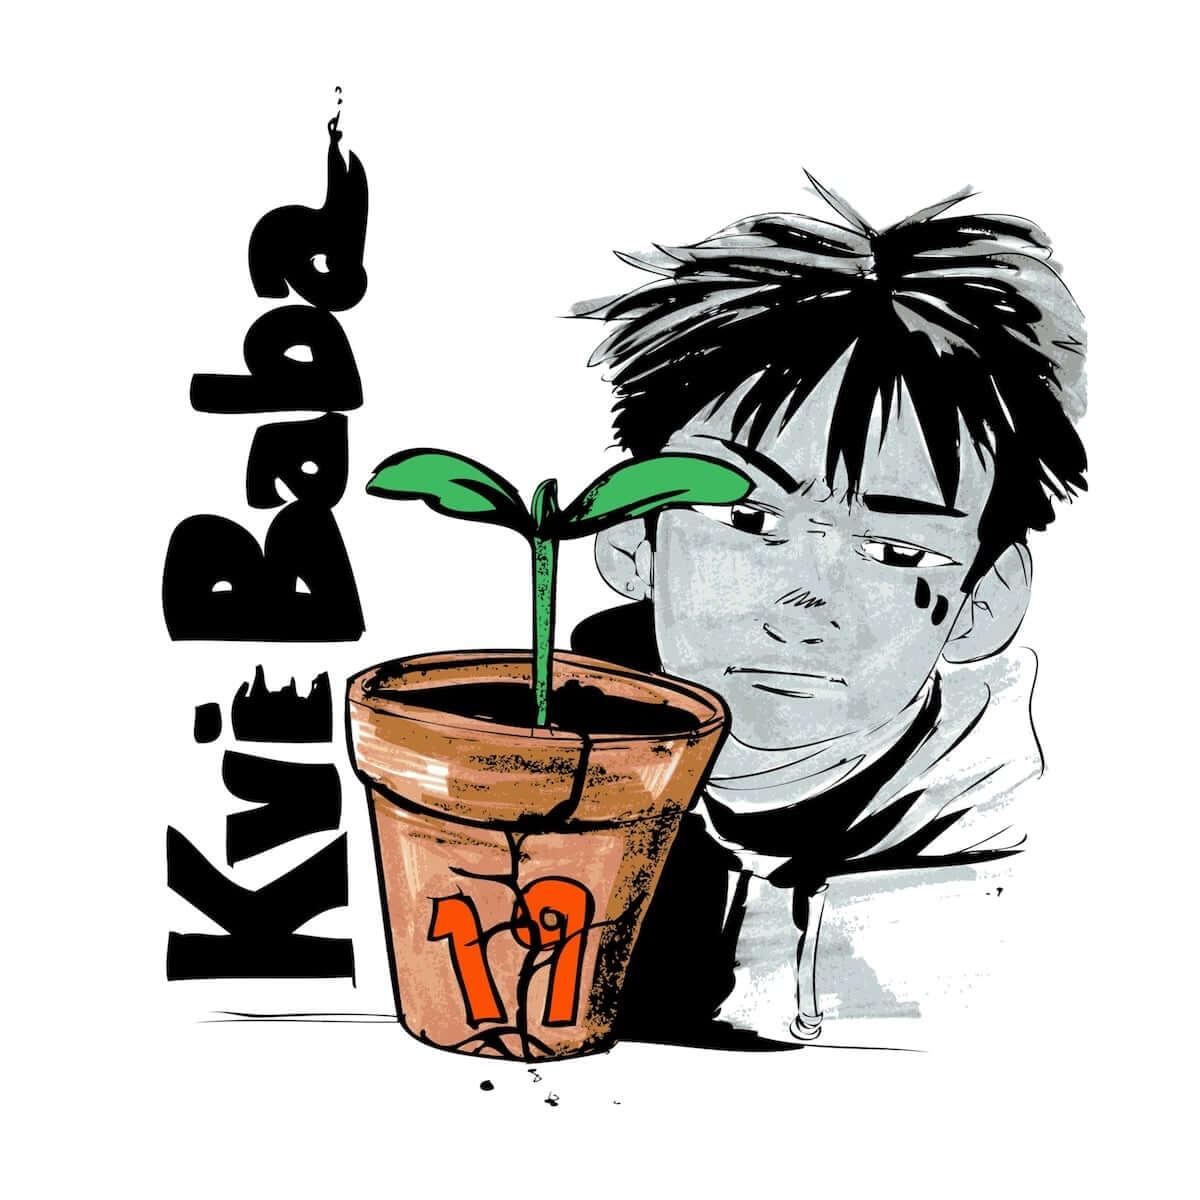 Kvi BabaによるSALUの最新曲「Rap Game」リミックスMVが公開 music190322_kvibaba_1-1200x1200